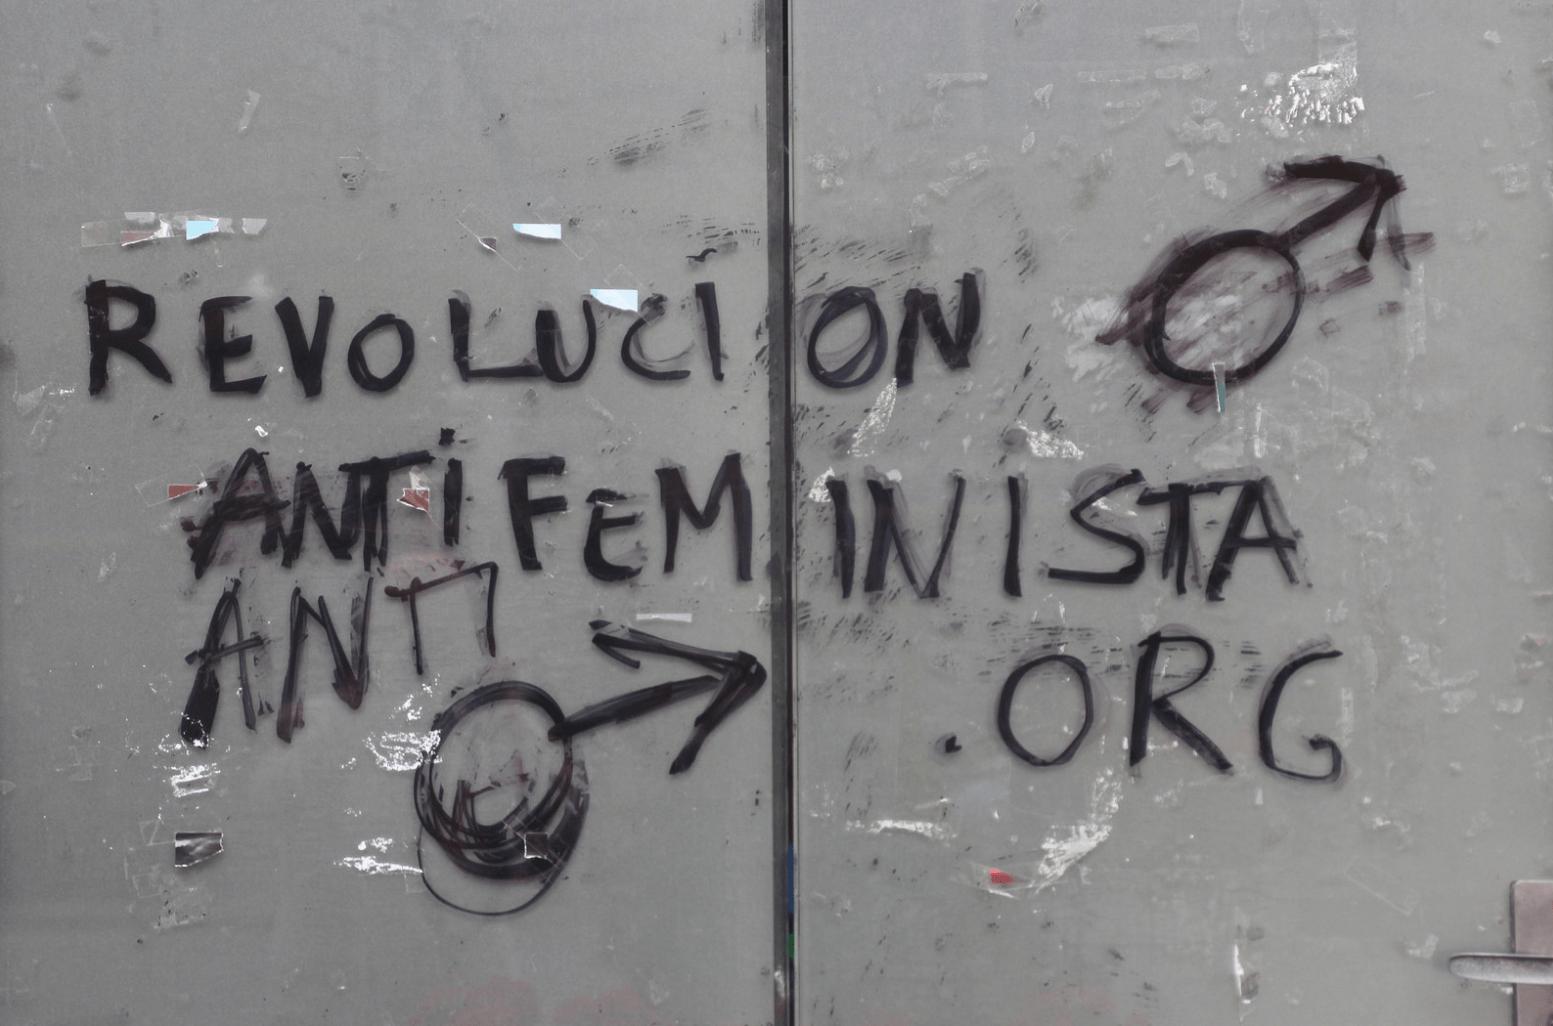 Le Jour ni l'Heure 6209 : Revolucion Antifeminista.org, Bilbao. Foto: Renaud Camus. Attribution 2.0 Generic (CC BY 2.0)